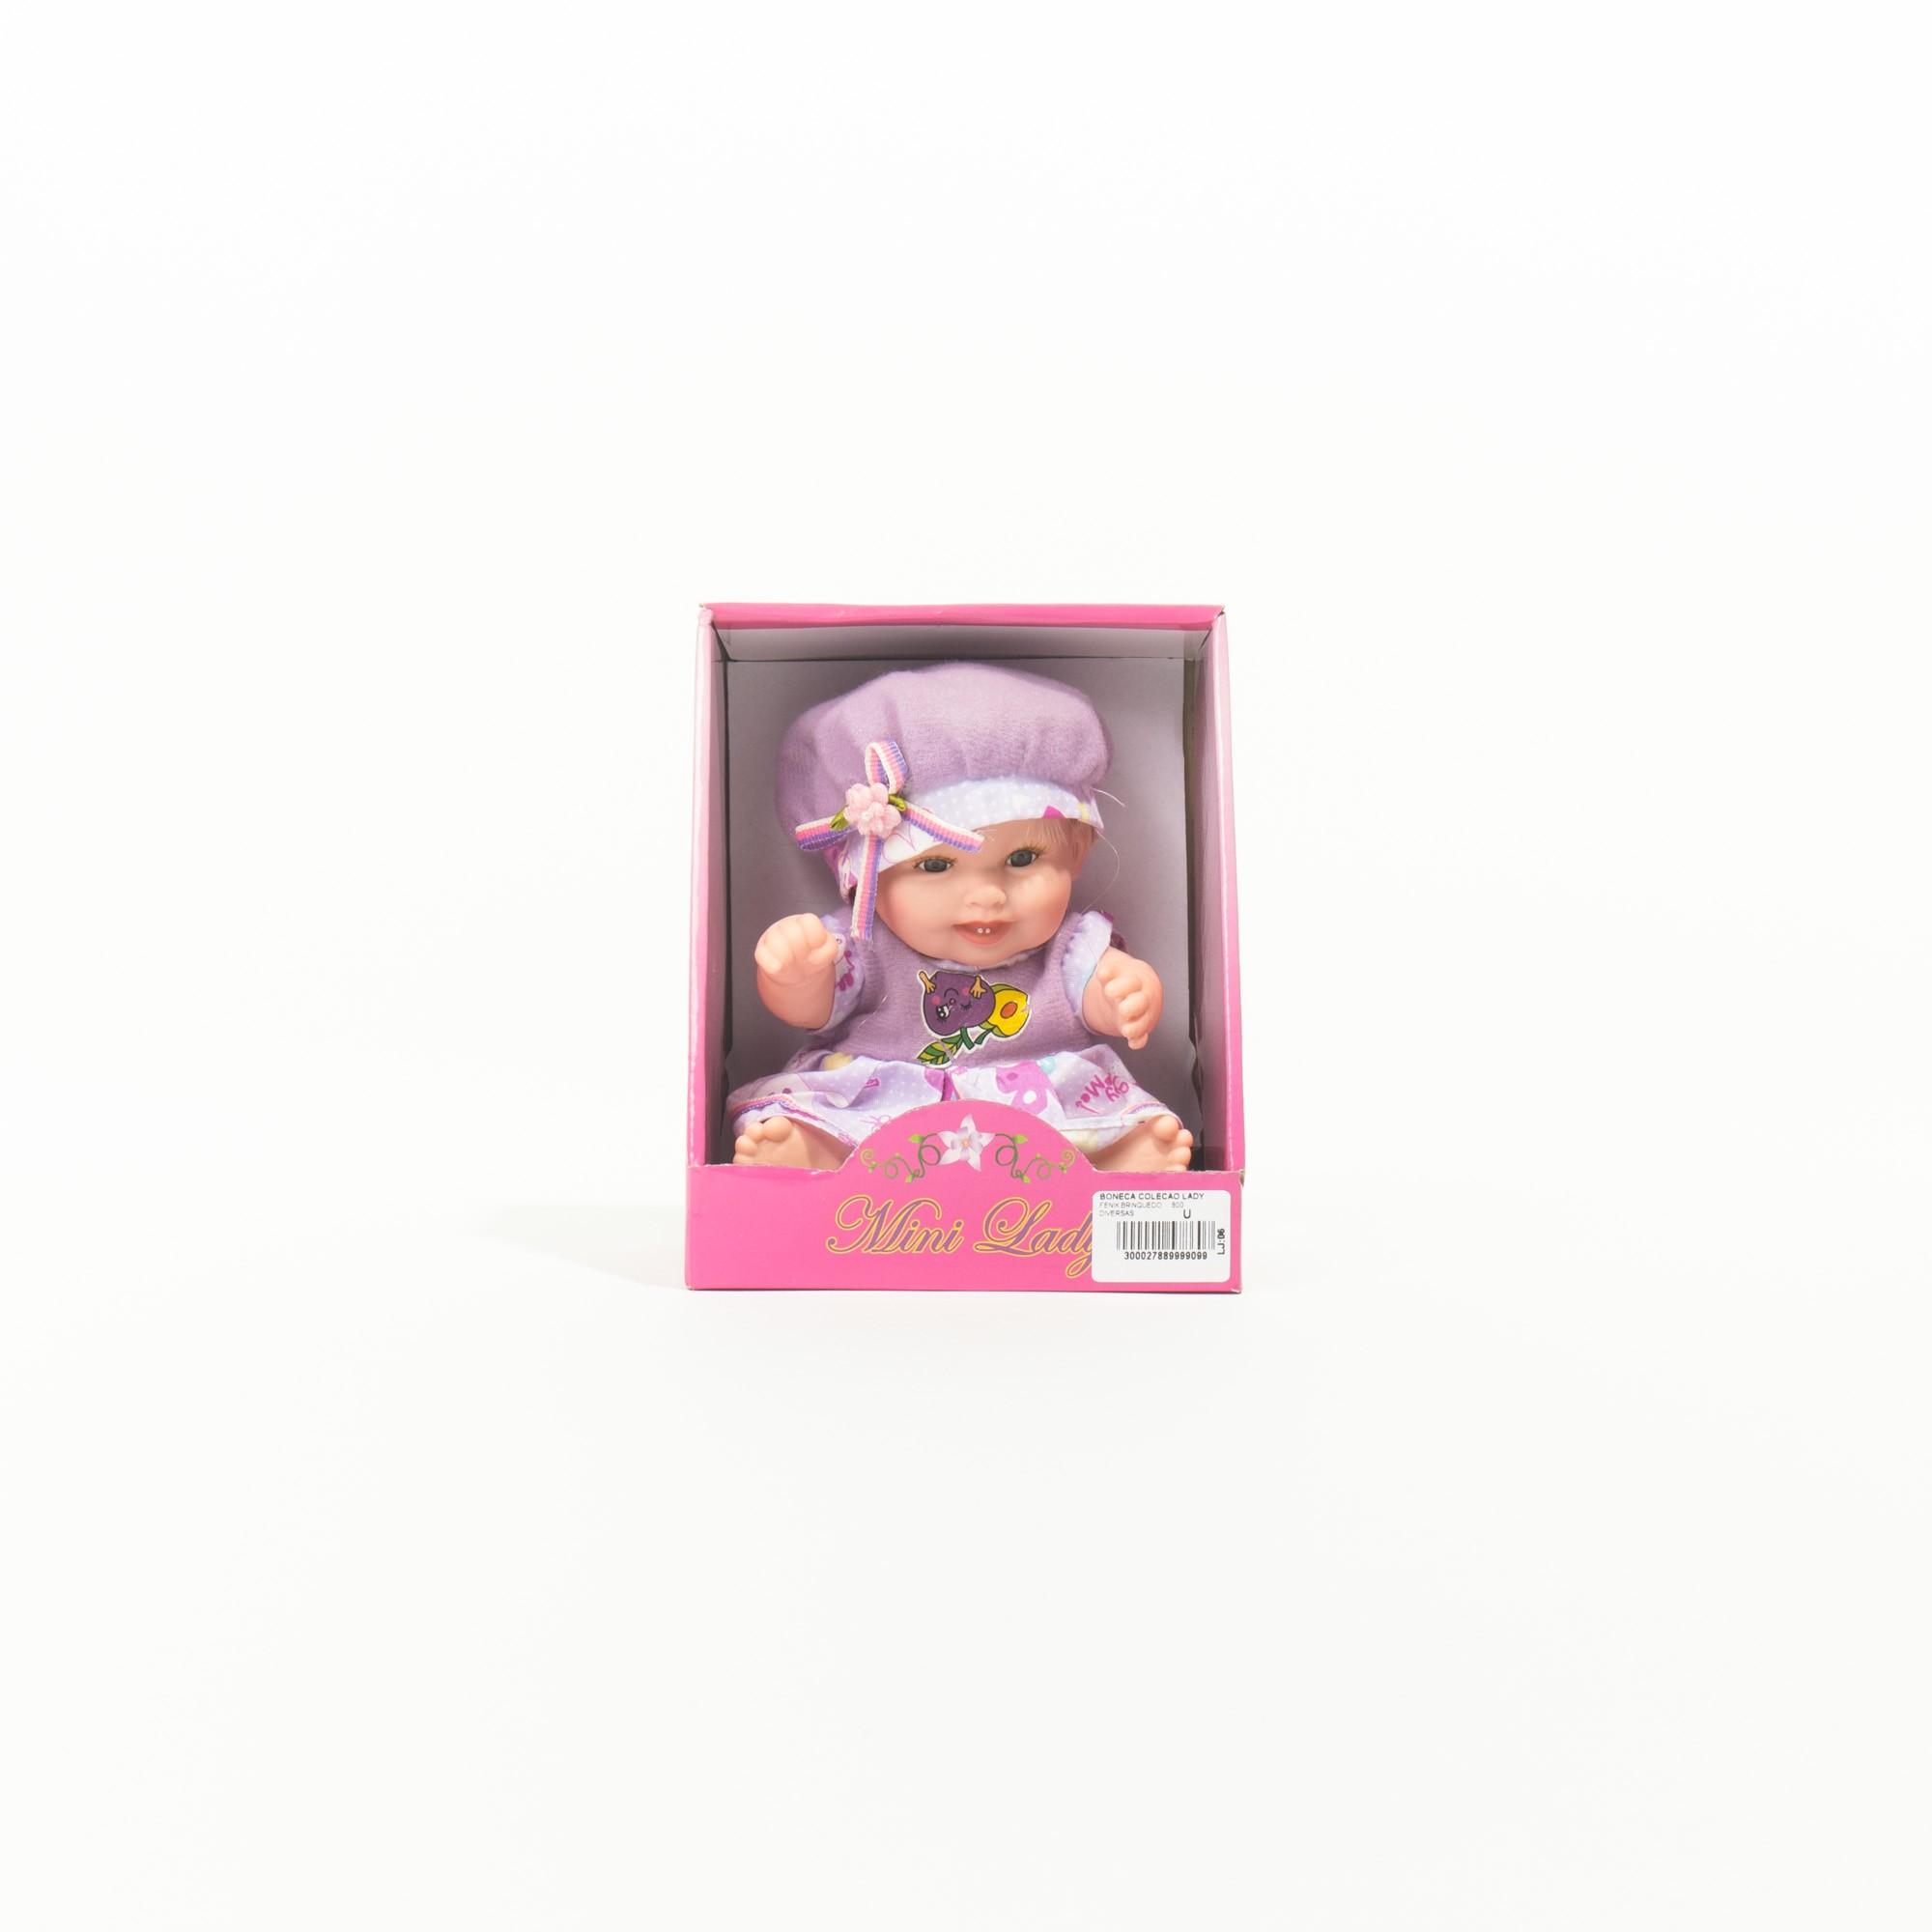 Coleção Mini Boneca Lady -Fenix